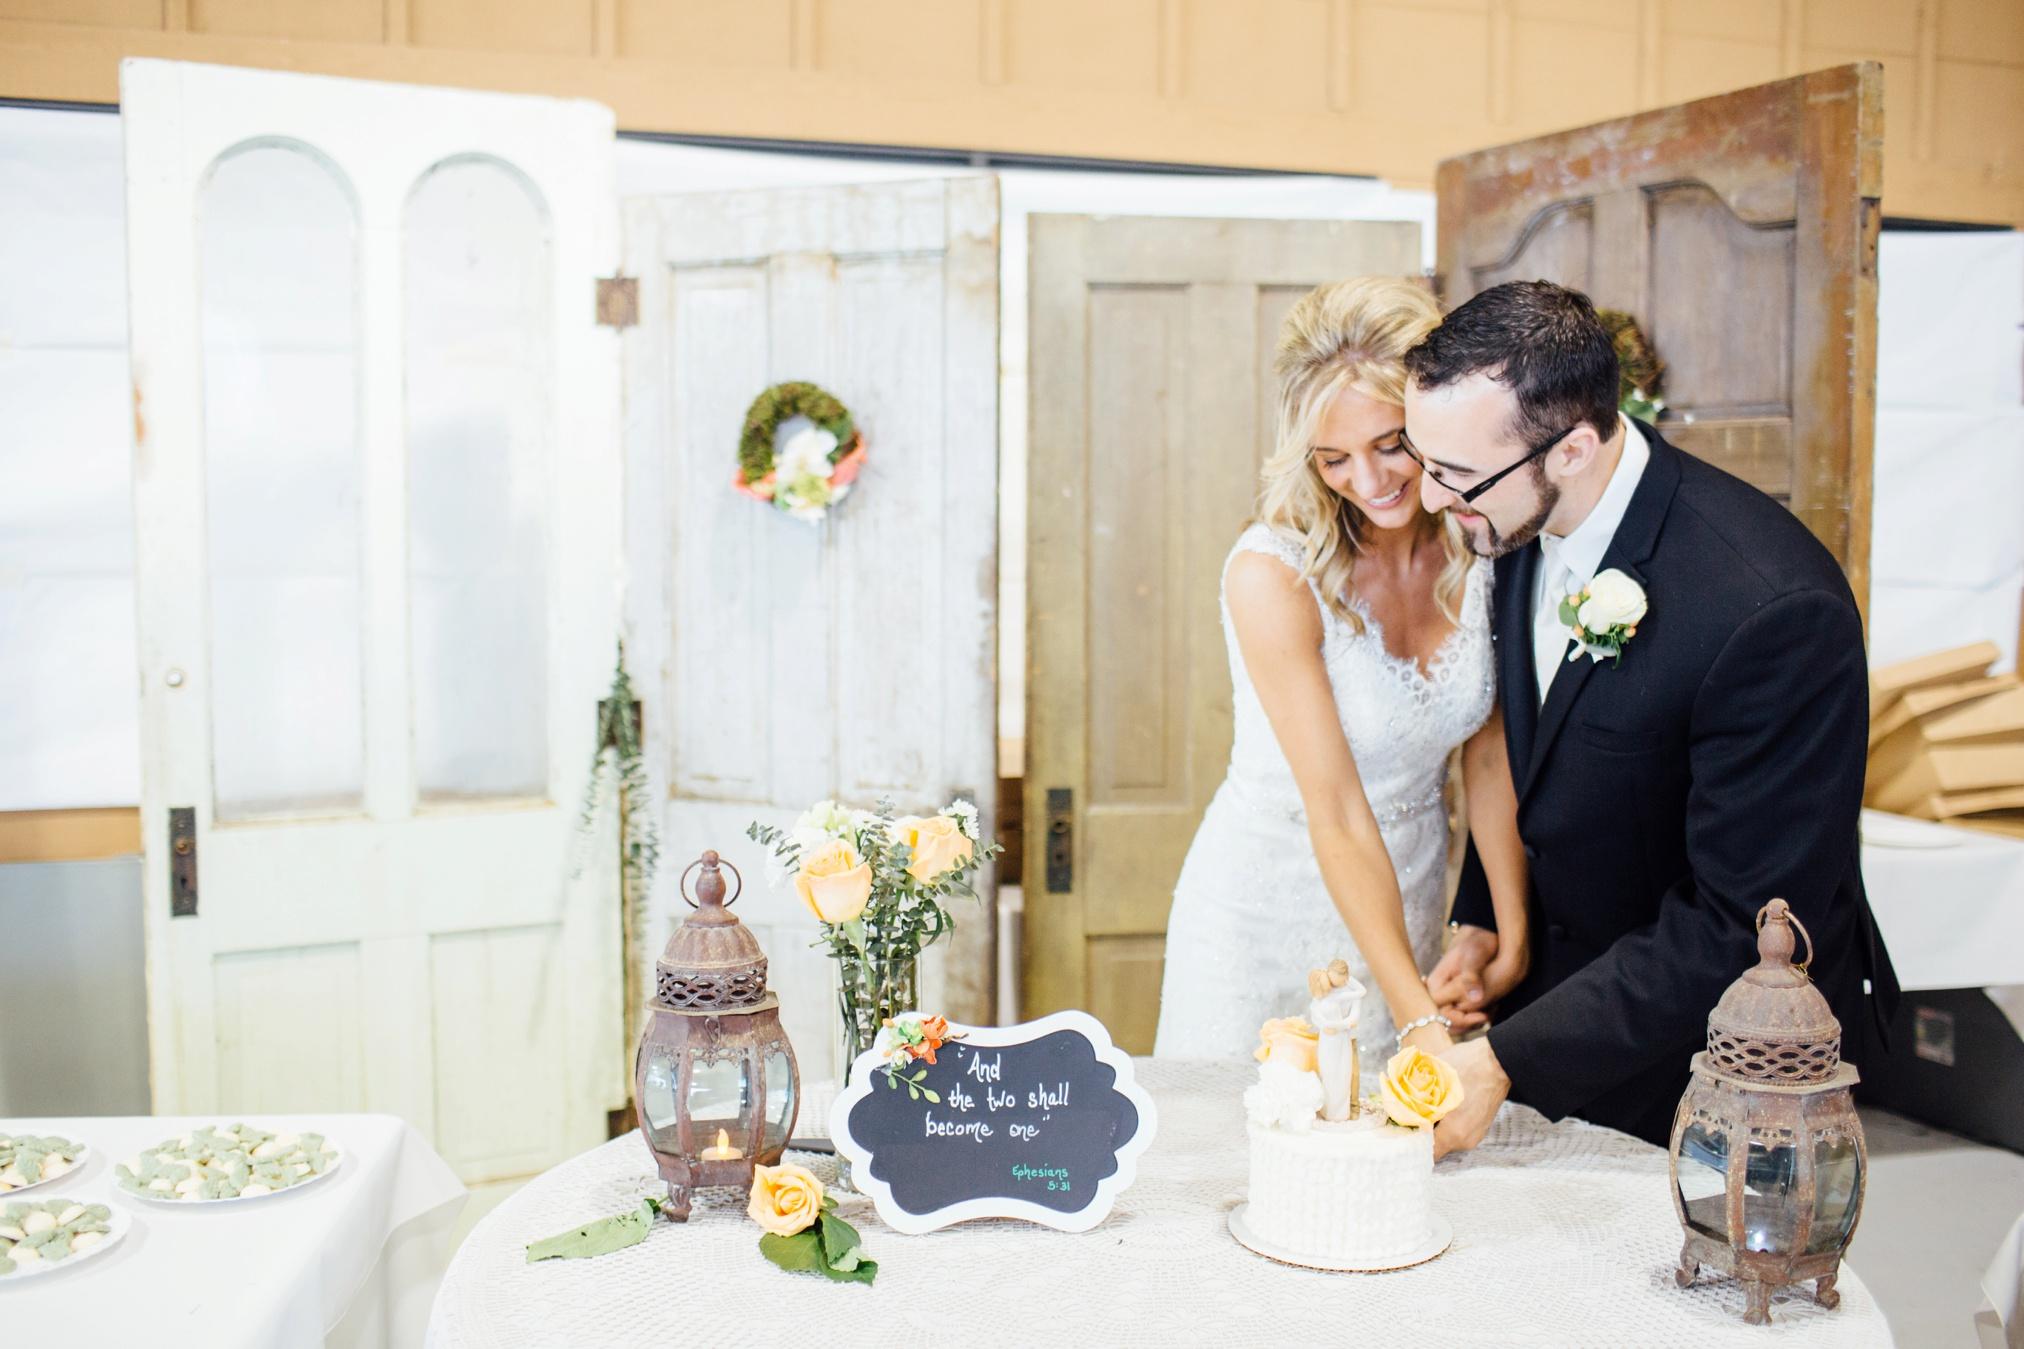 schmid_wedding-751.jpg